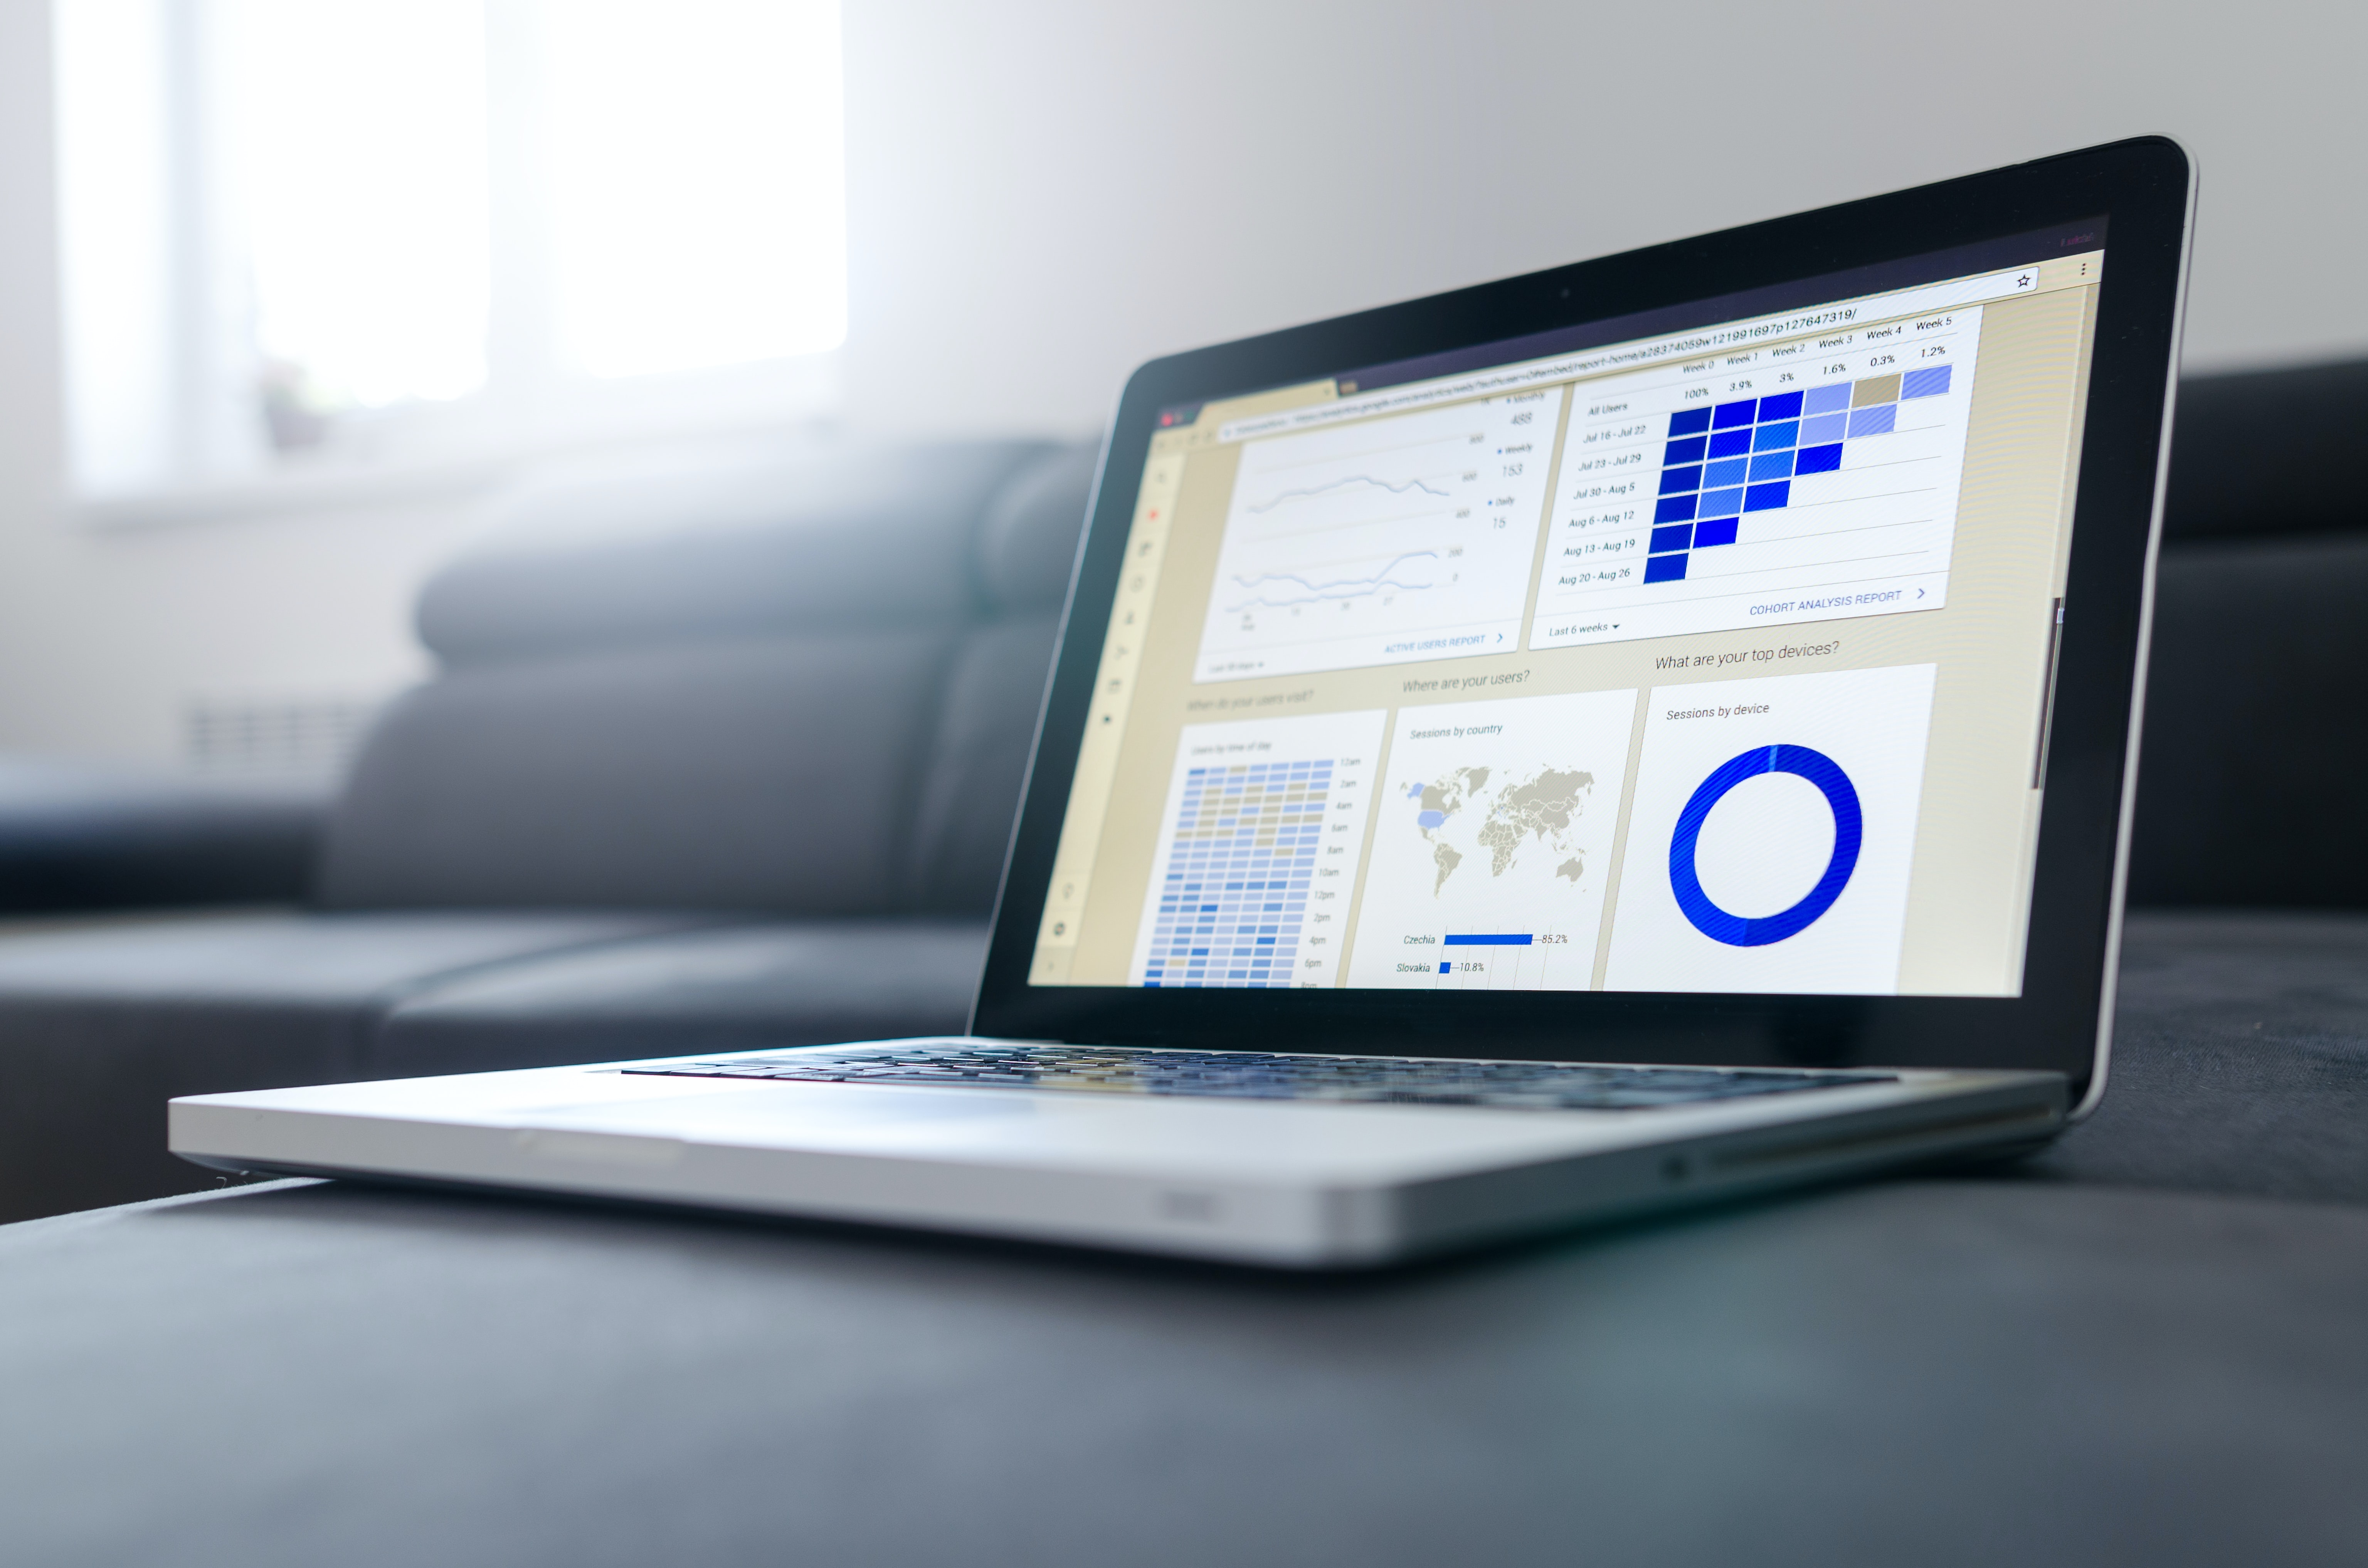 Laptop screen showing an analytics interface